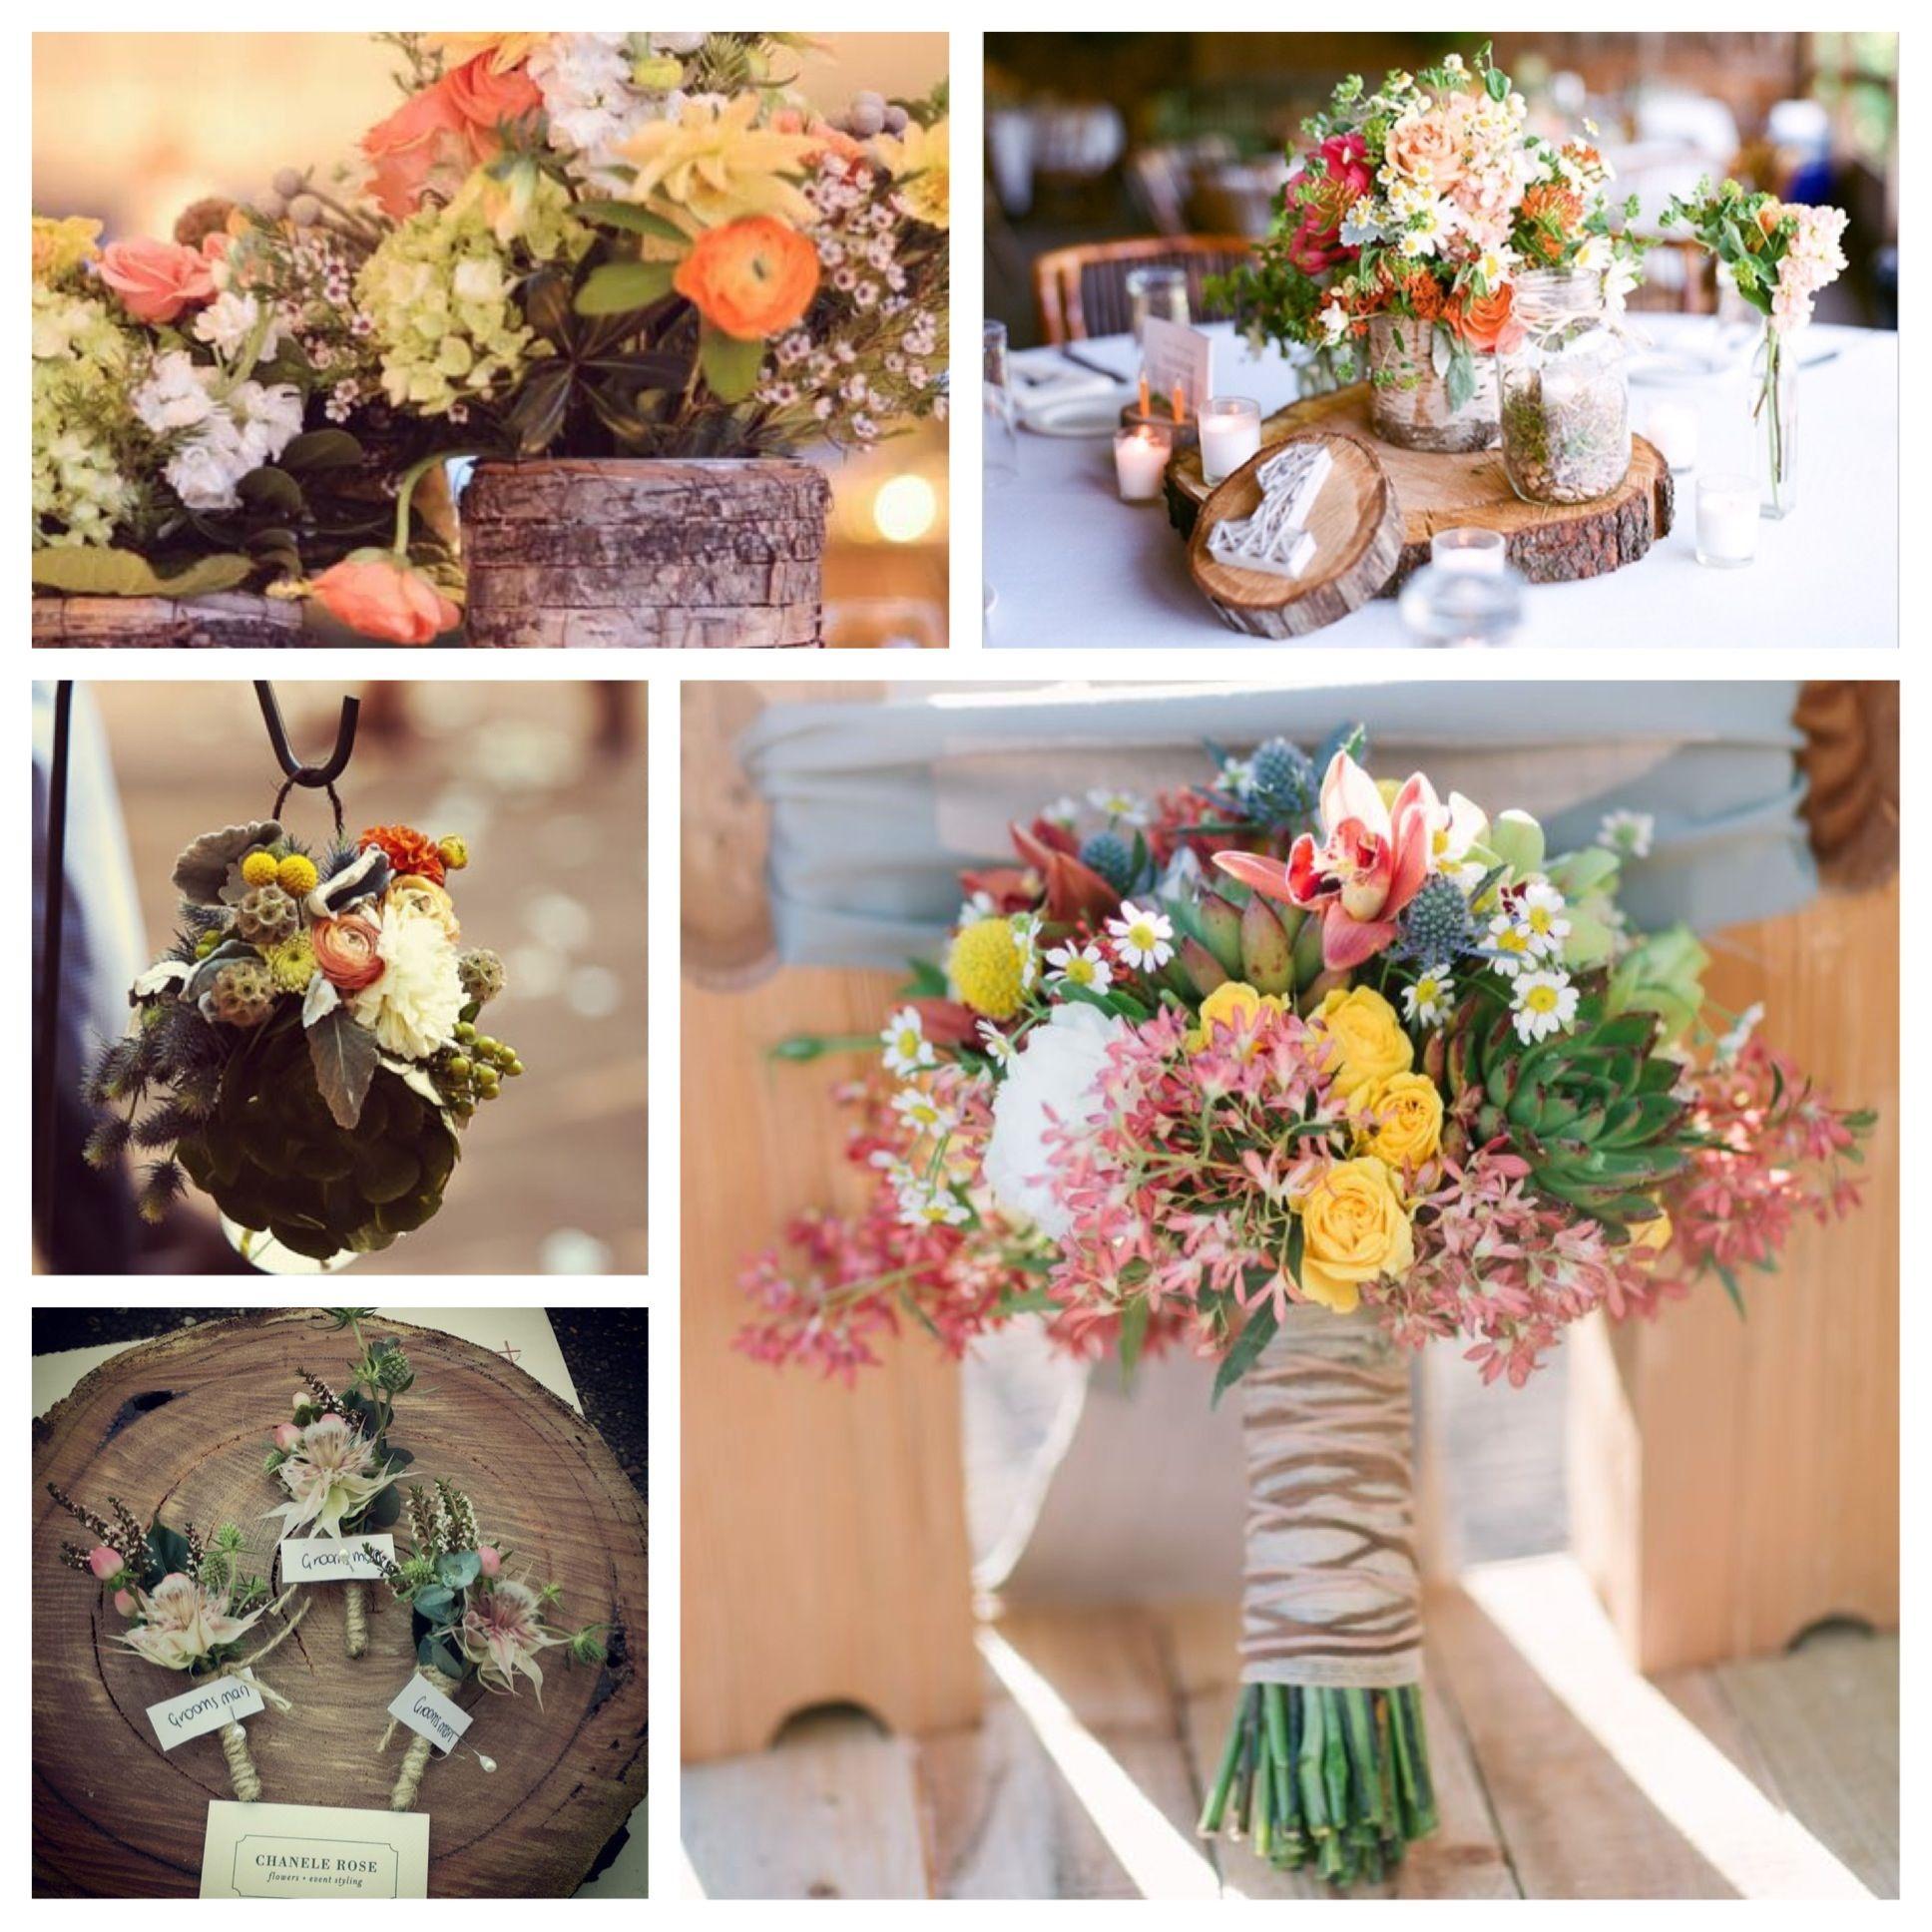 Wedding decor images  Rustic wildflower wedding decor  Awesome wedding ideas  Pinterest